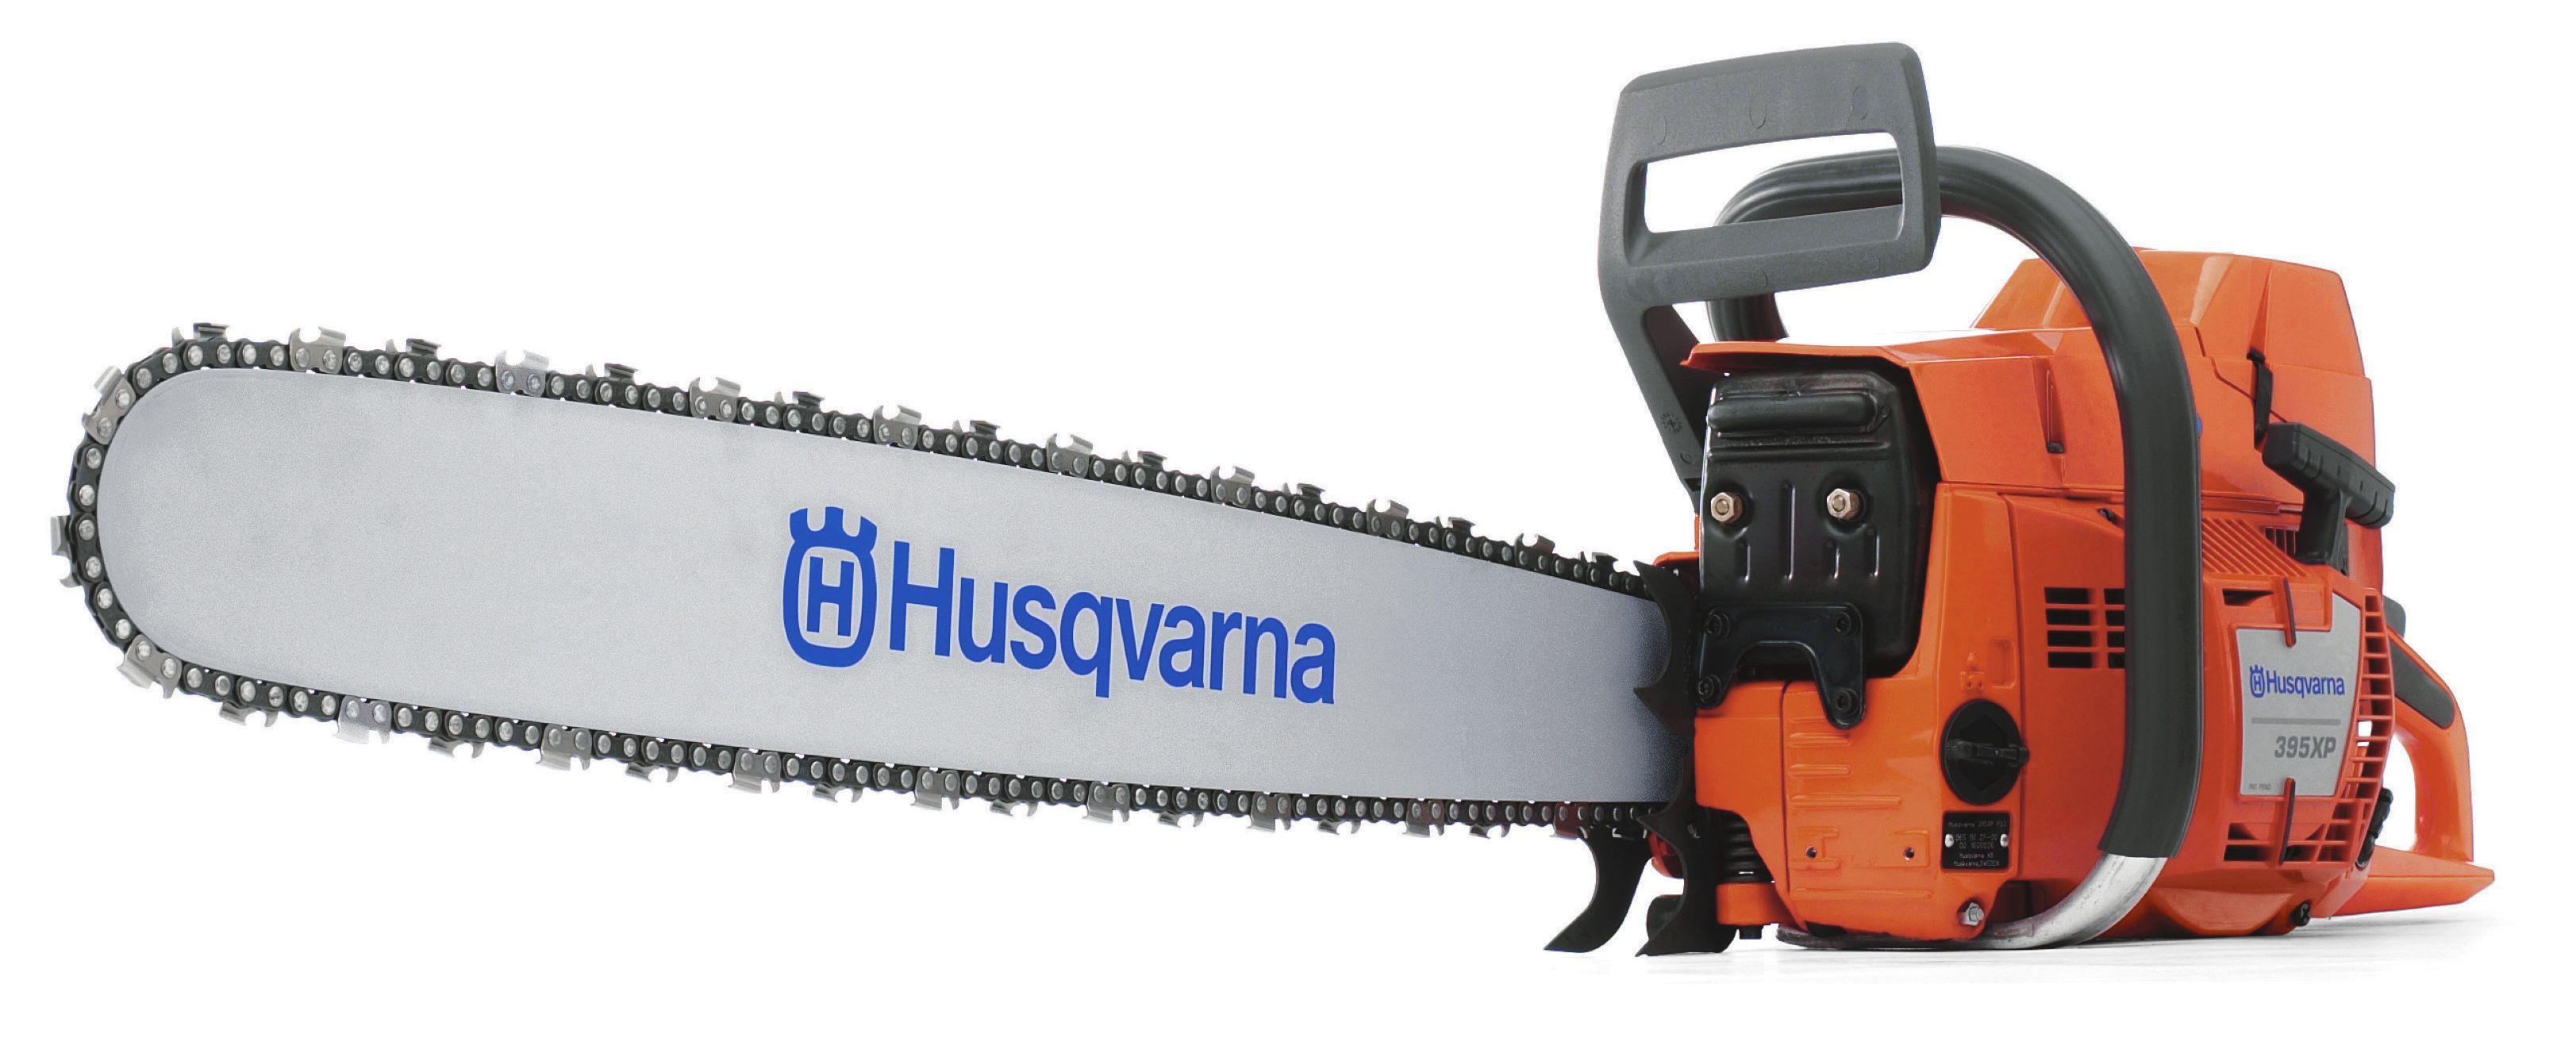 Бензопила Husqvarna 395xp (9659021-94) silver streak 290292 throttle control cable for husqvarna 577 52 94 01 husqvarna 577 52 94